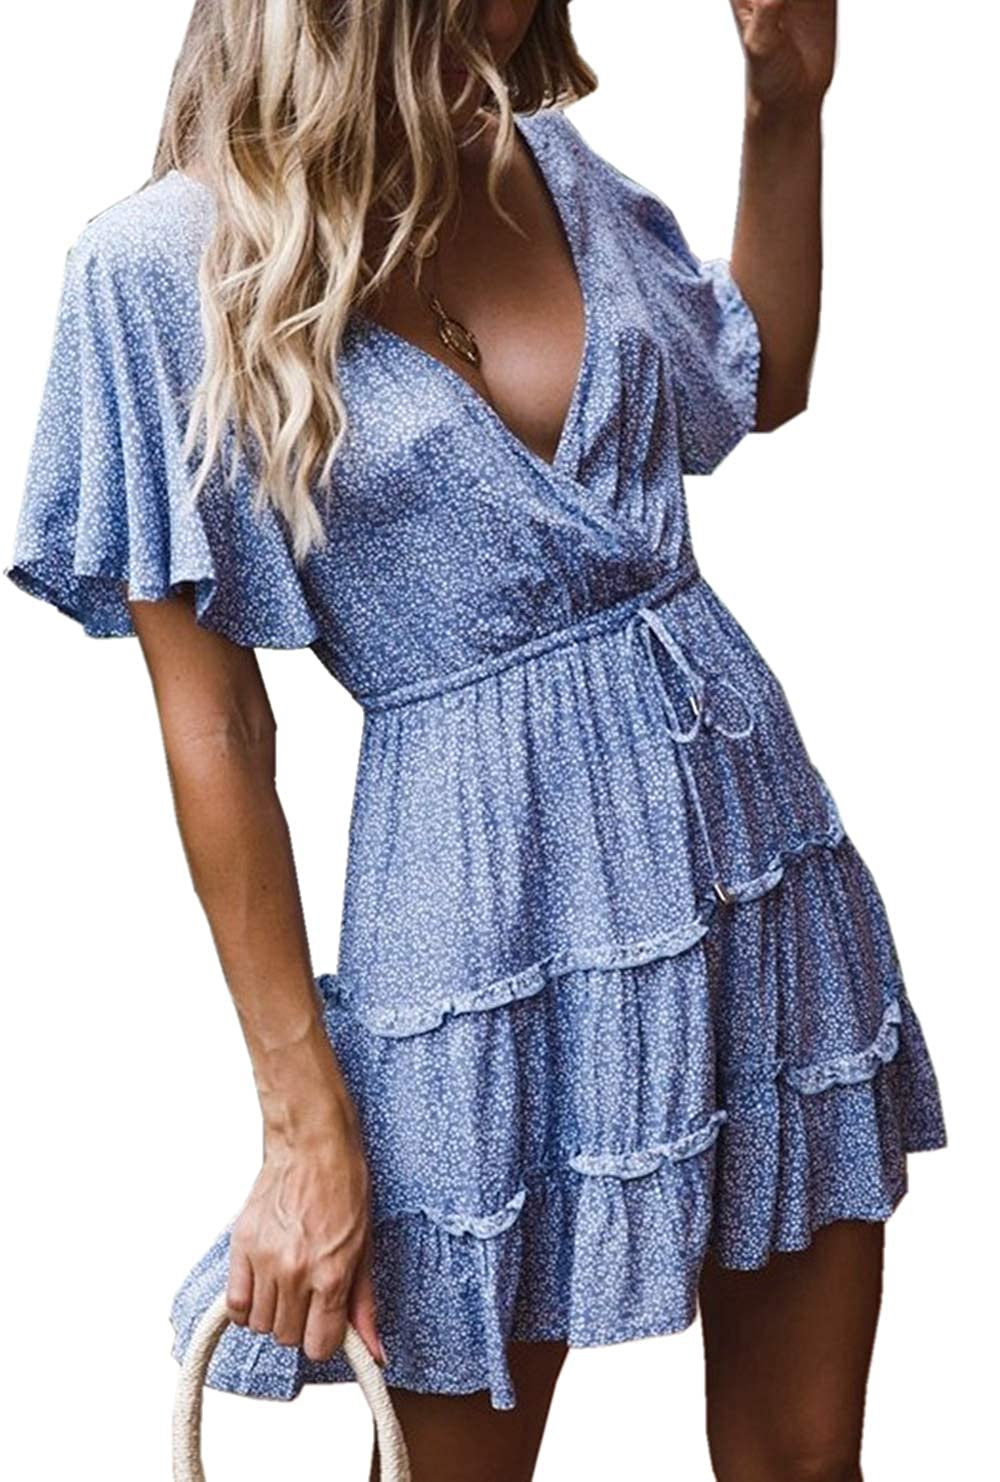 ZIYYOOHY Damen Blusenkleid Mini Polka Kurzarm V Ausschnitt Sommerkleider Strandkleid